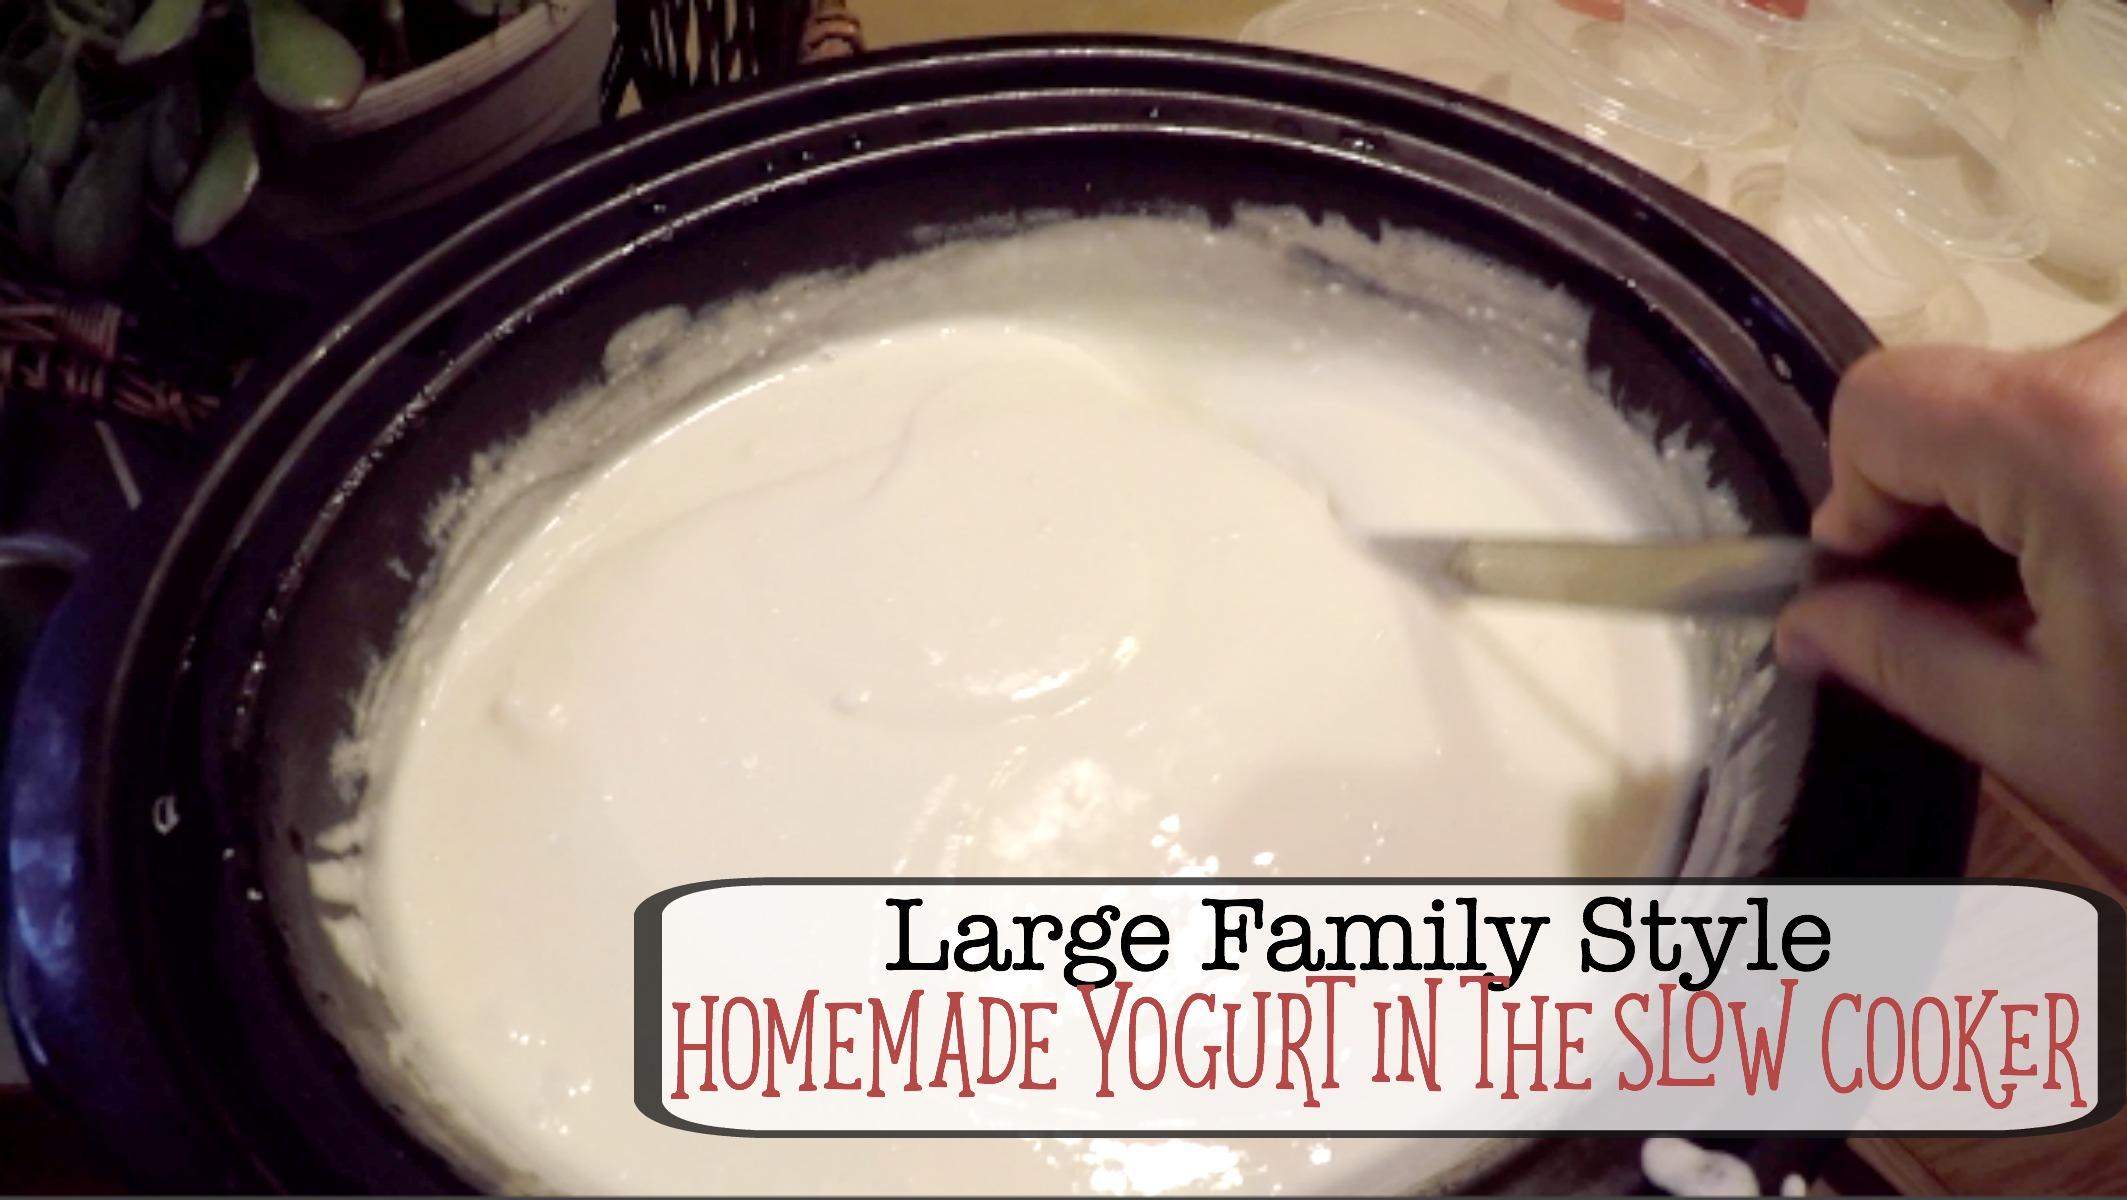 Homemade Yogurt in the Slow Cooker